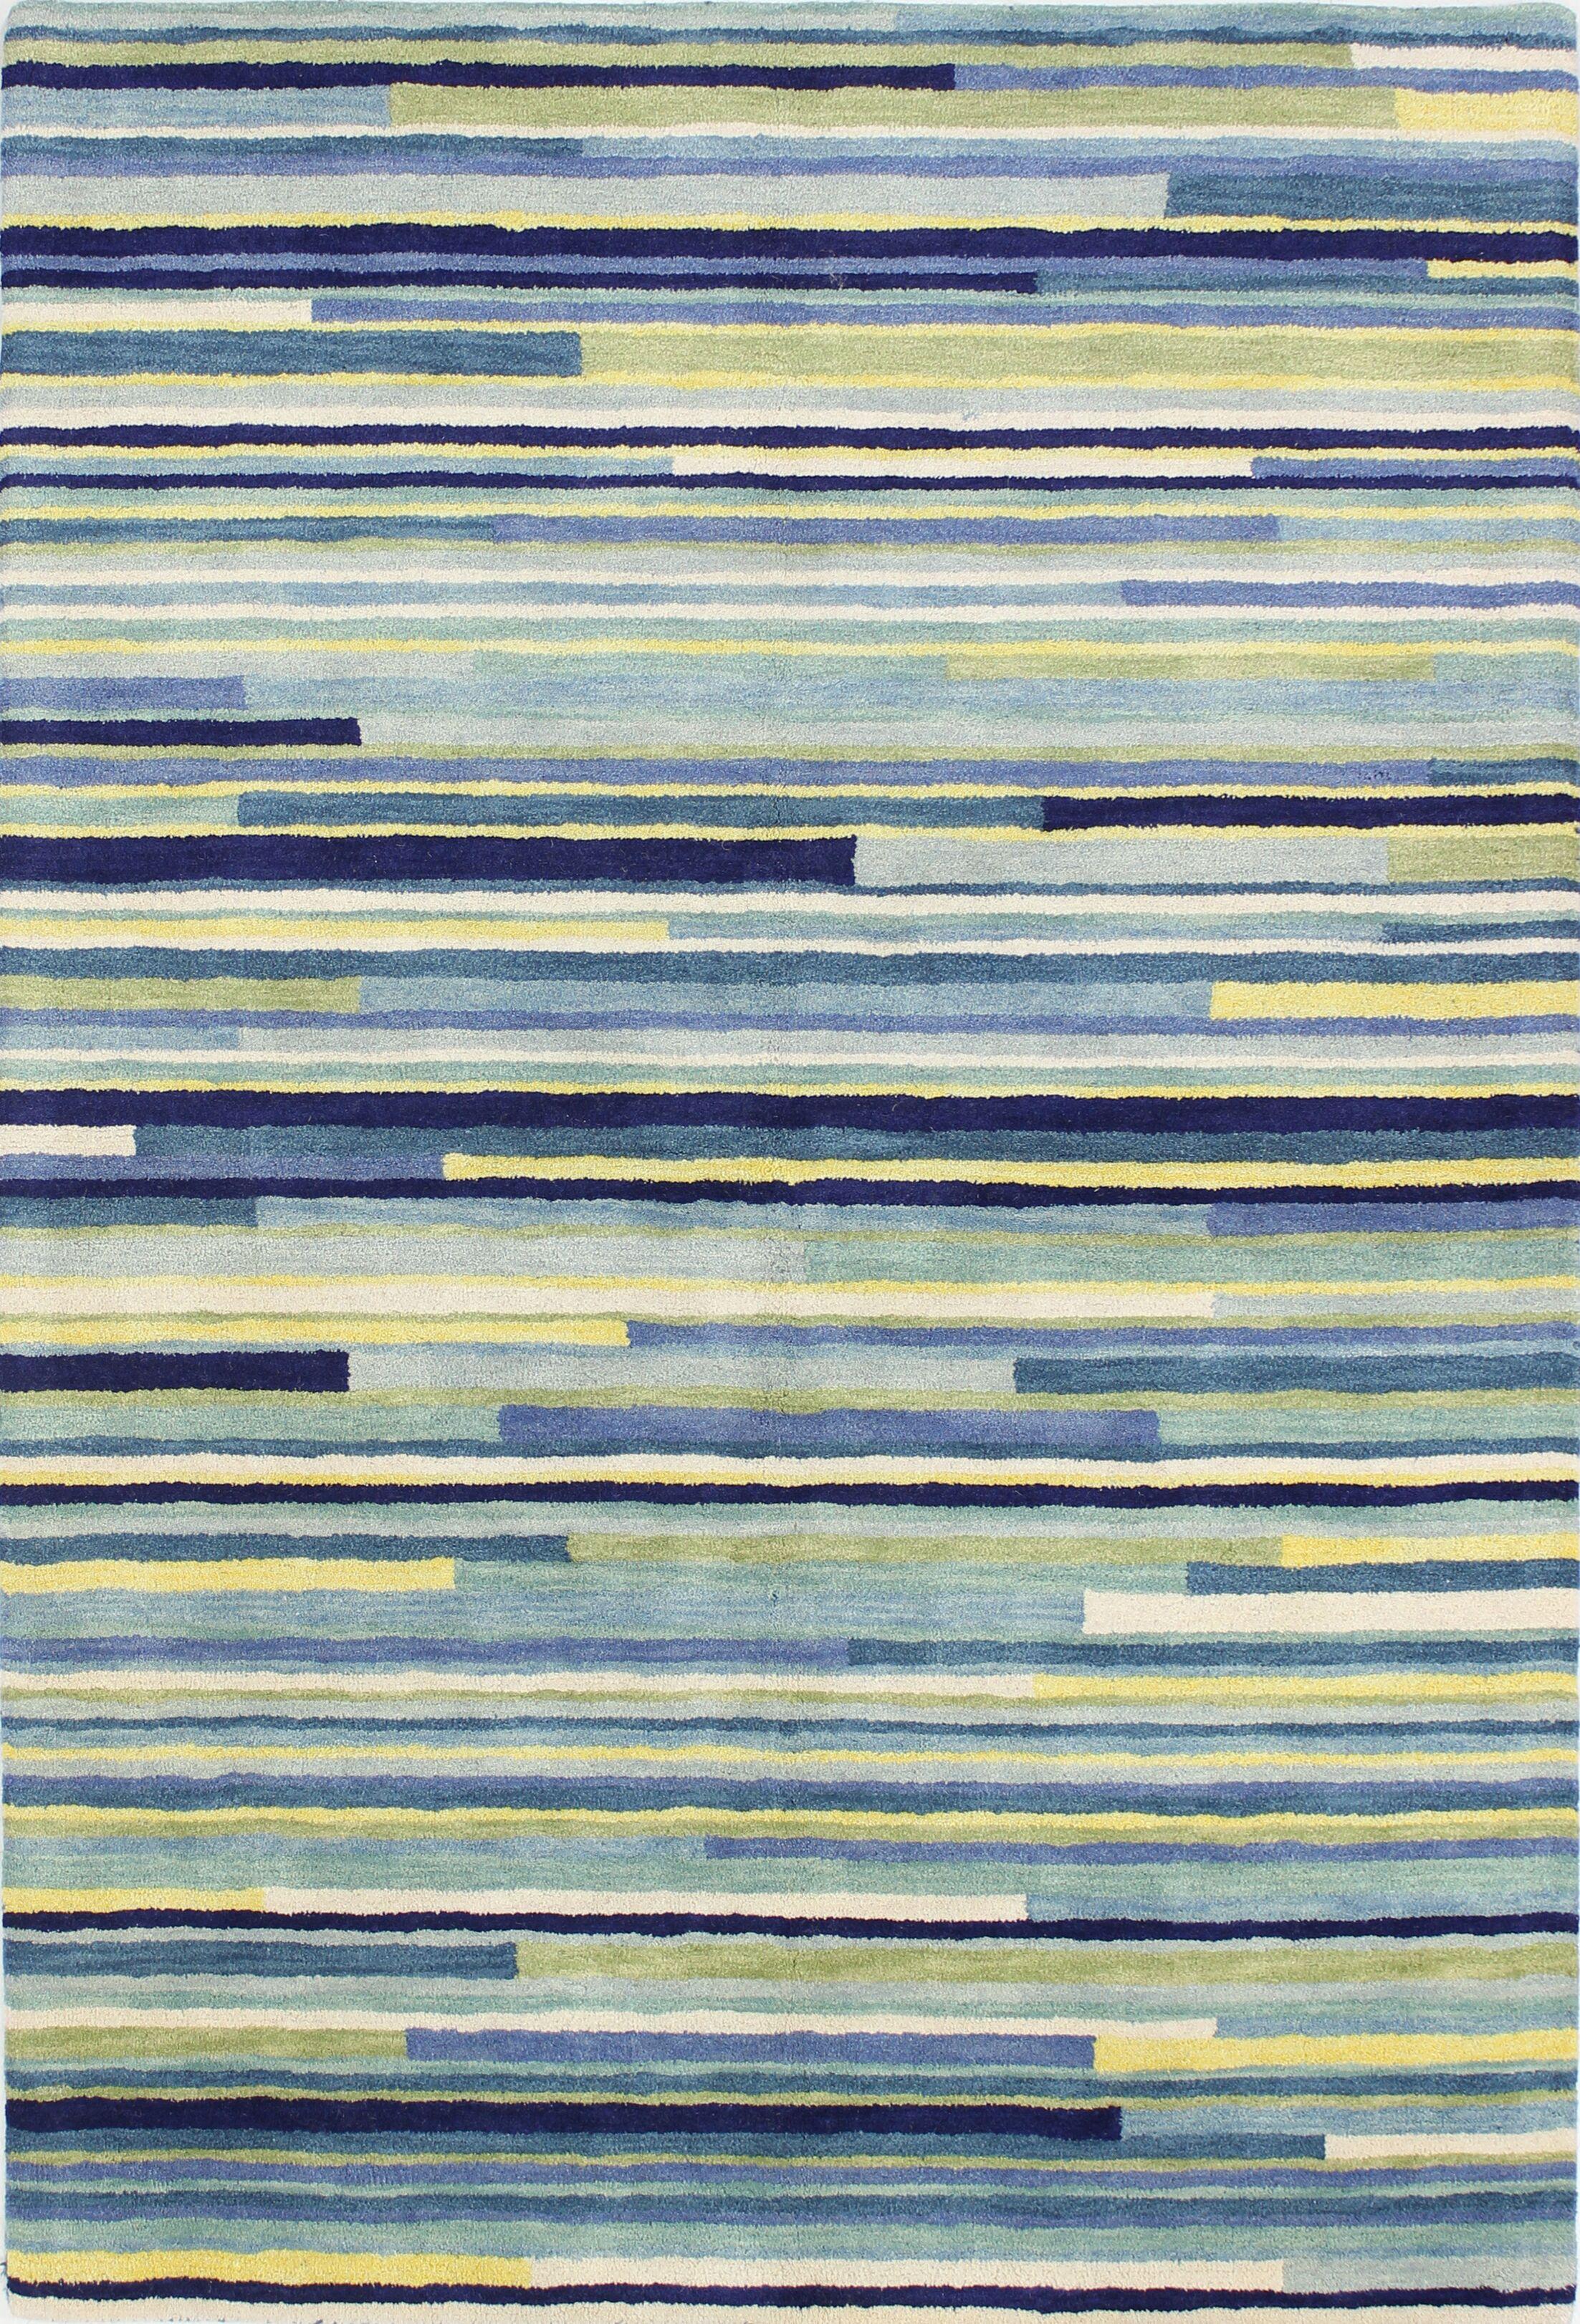 Tilton Rug in Blue Rug Size: Rectangle 5' x 7'